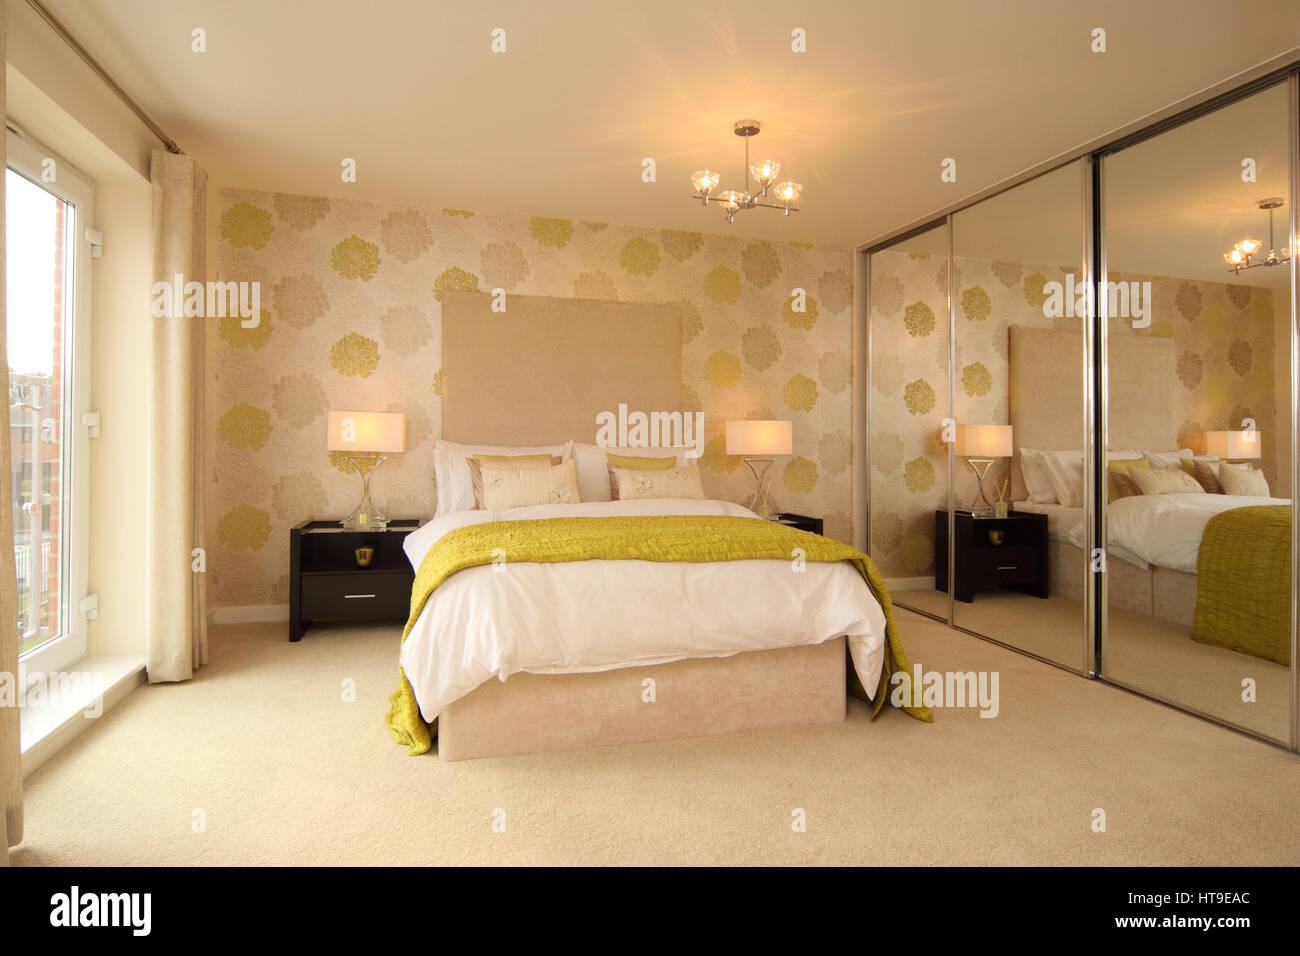 Home interior, modern bedroom, spacious, mirrored wardrobe, yellow cream decor, lamps, bedspread, throw, cushions, - Stock Image